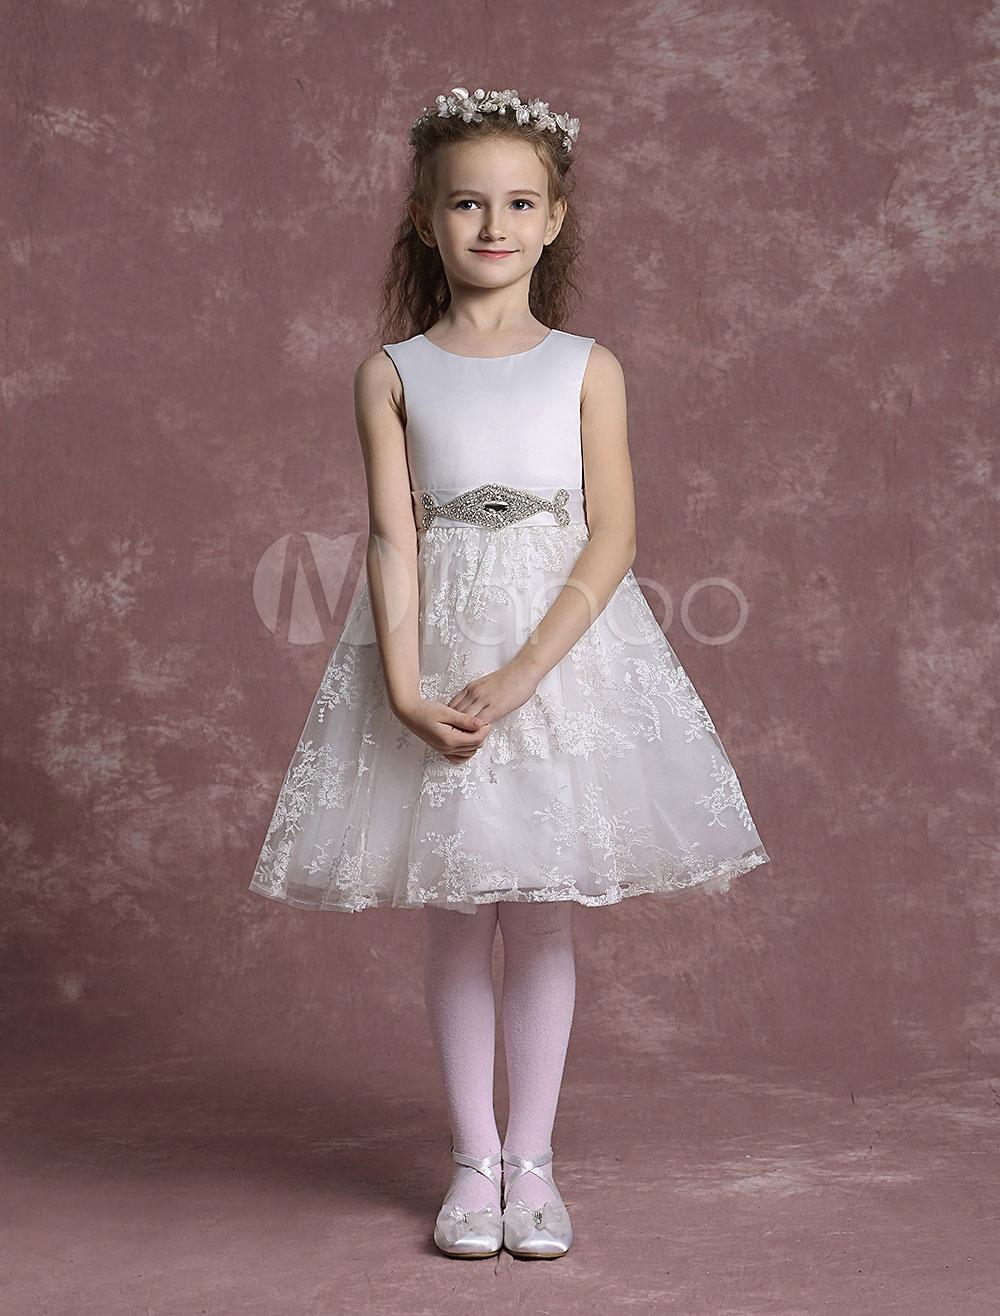 5324f132d5fdb Robe Mariage Enfant - Acheter Robe Mariage Enfant aux petits prix ...